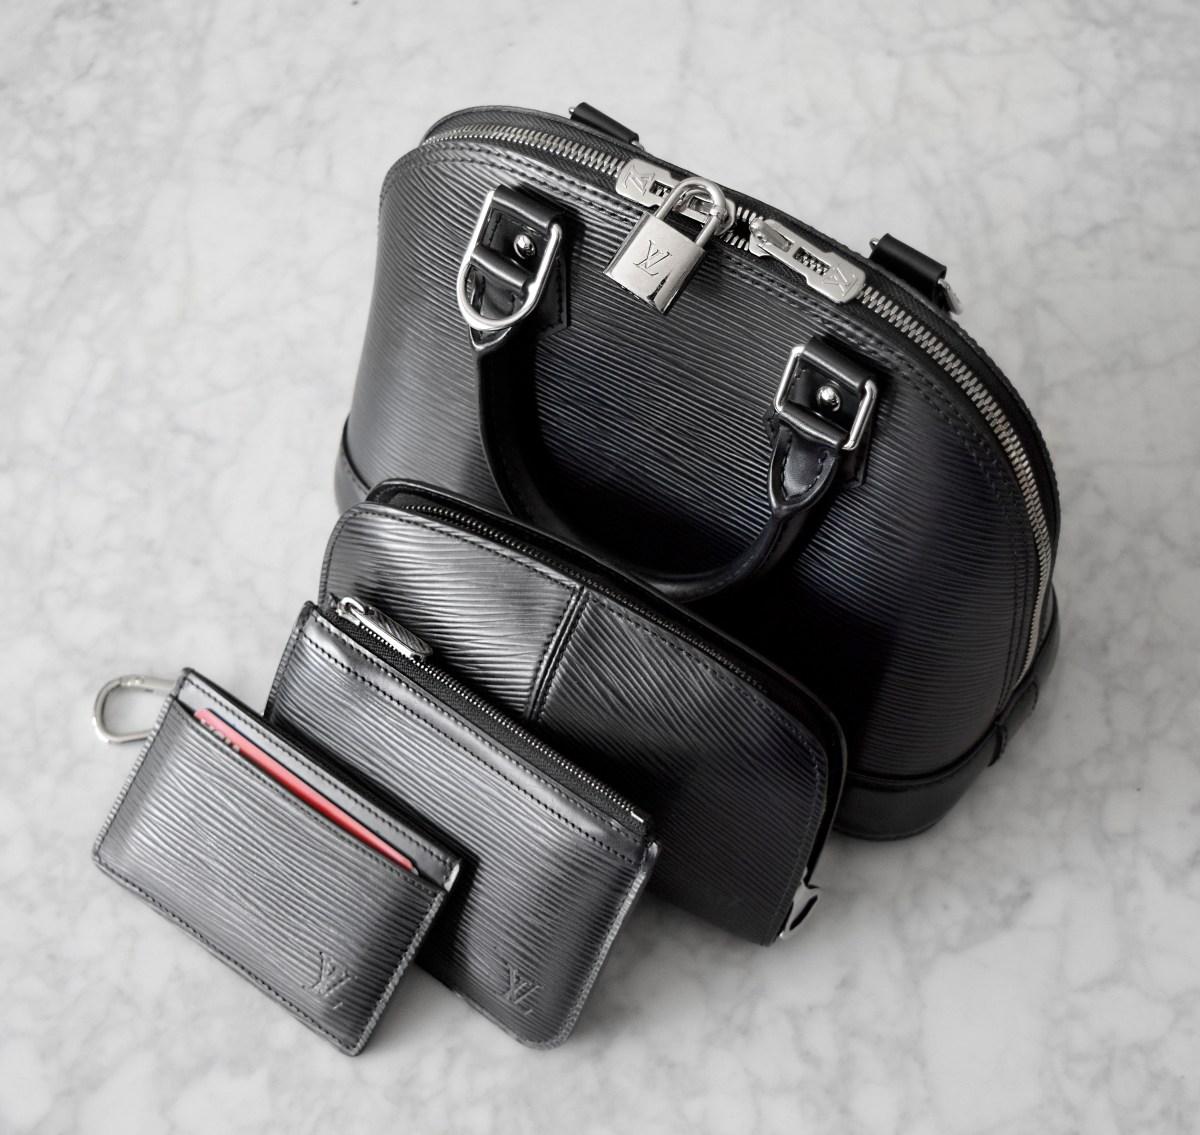 Louis Vuitton Epi Leather Alma BB and SLG Collection   CoffeeAndHandbags.com